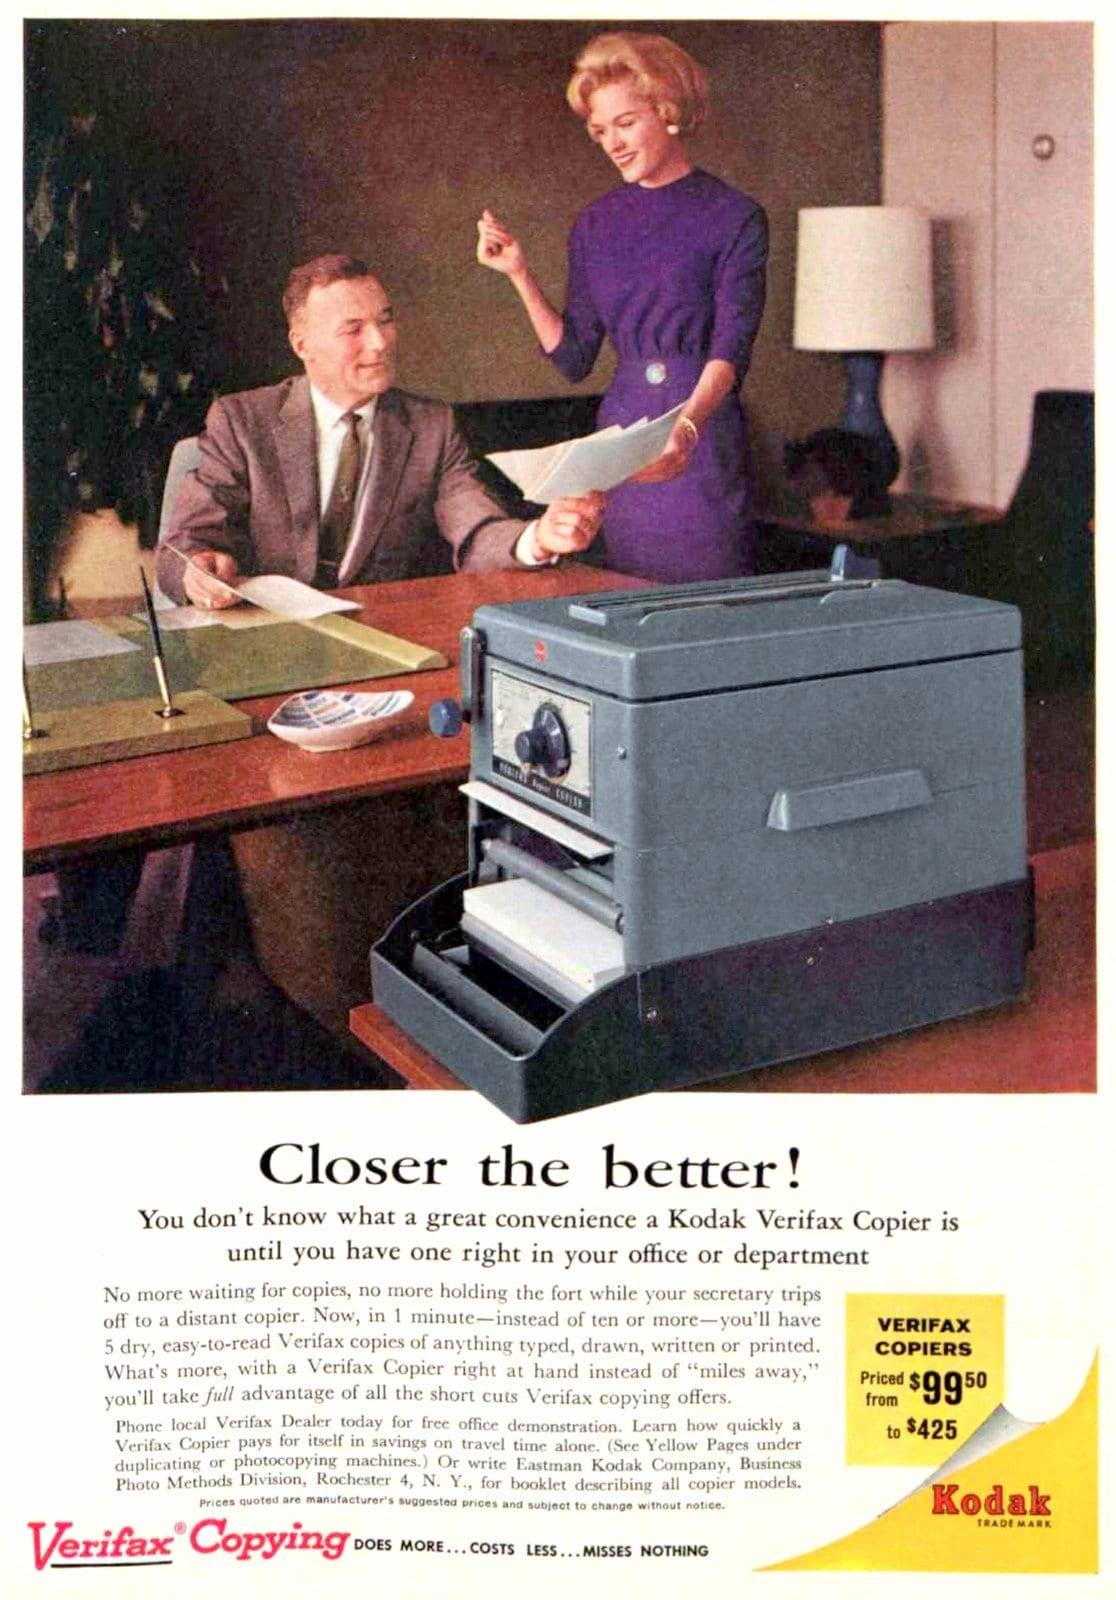 Old-fashioned Kodak Verifax Copying machine (1961)